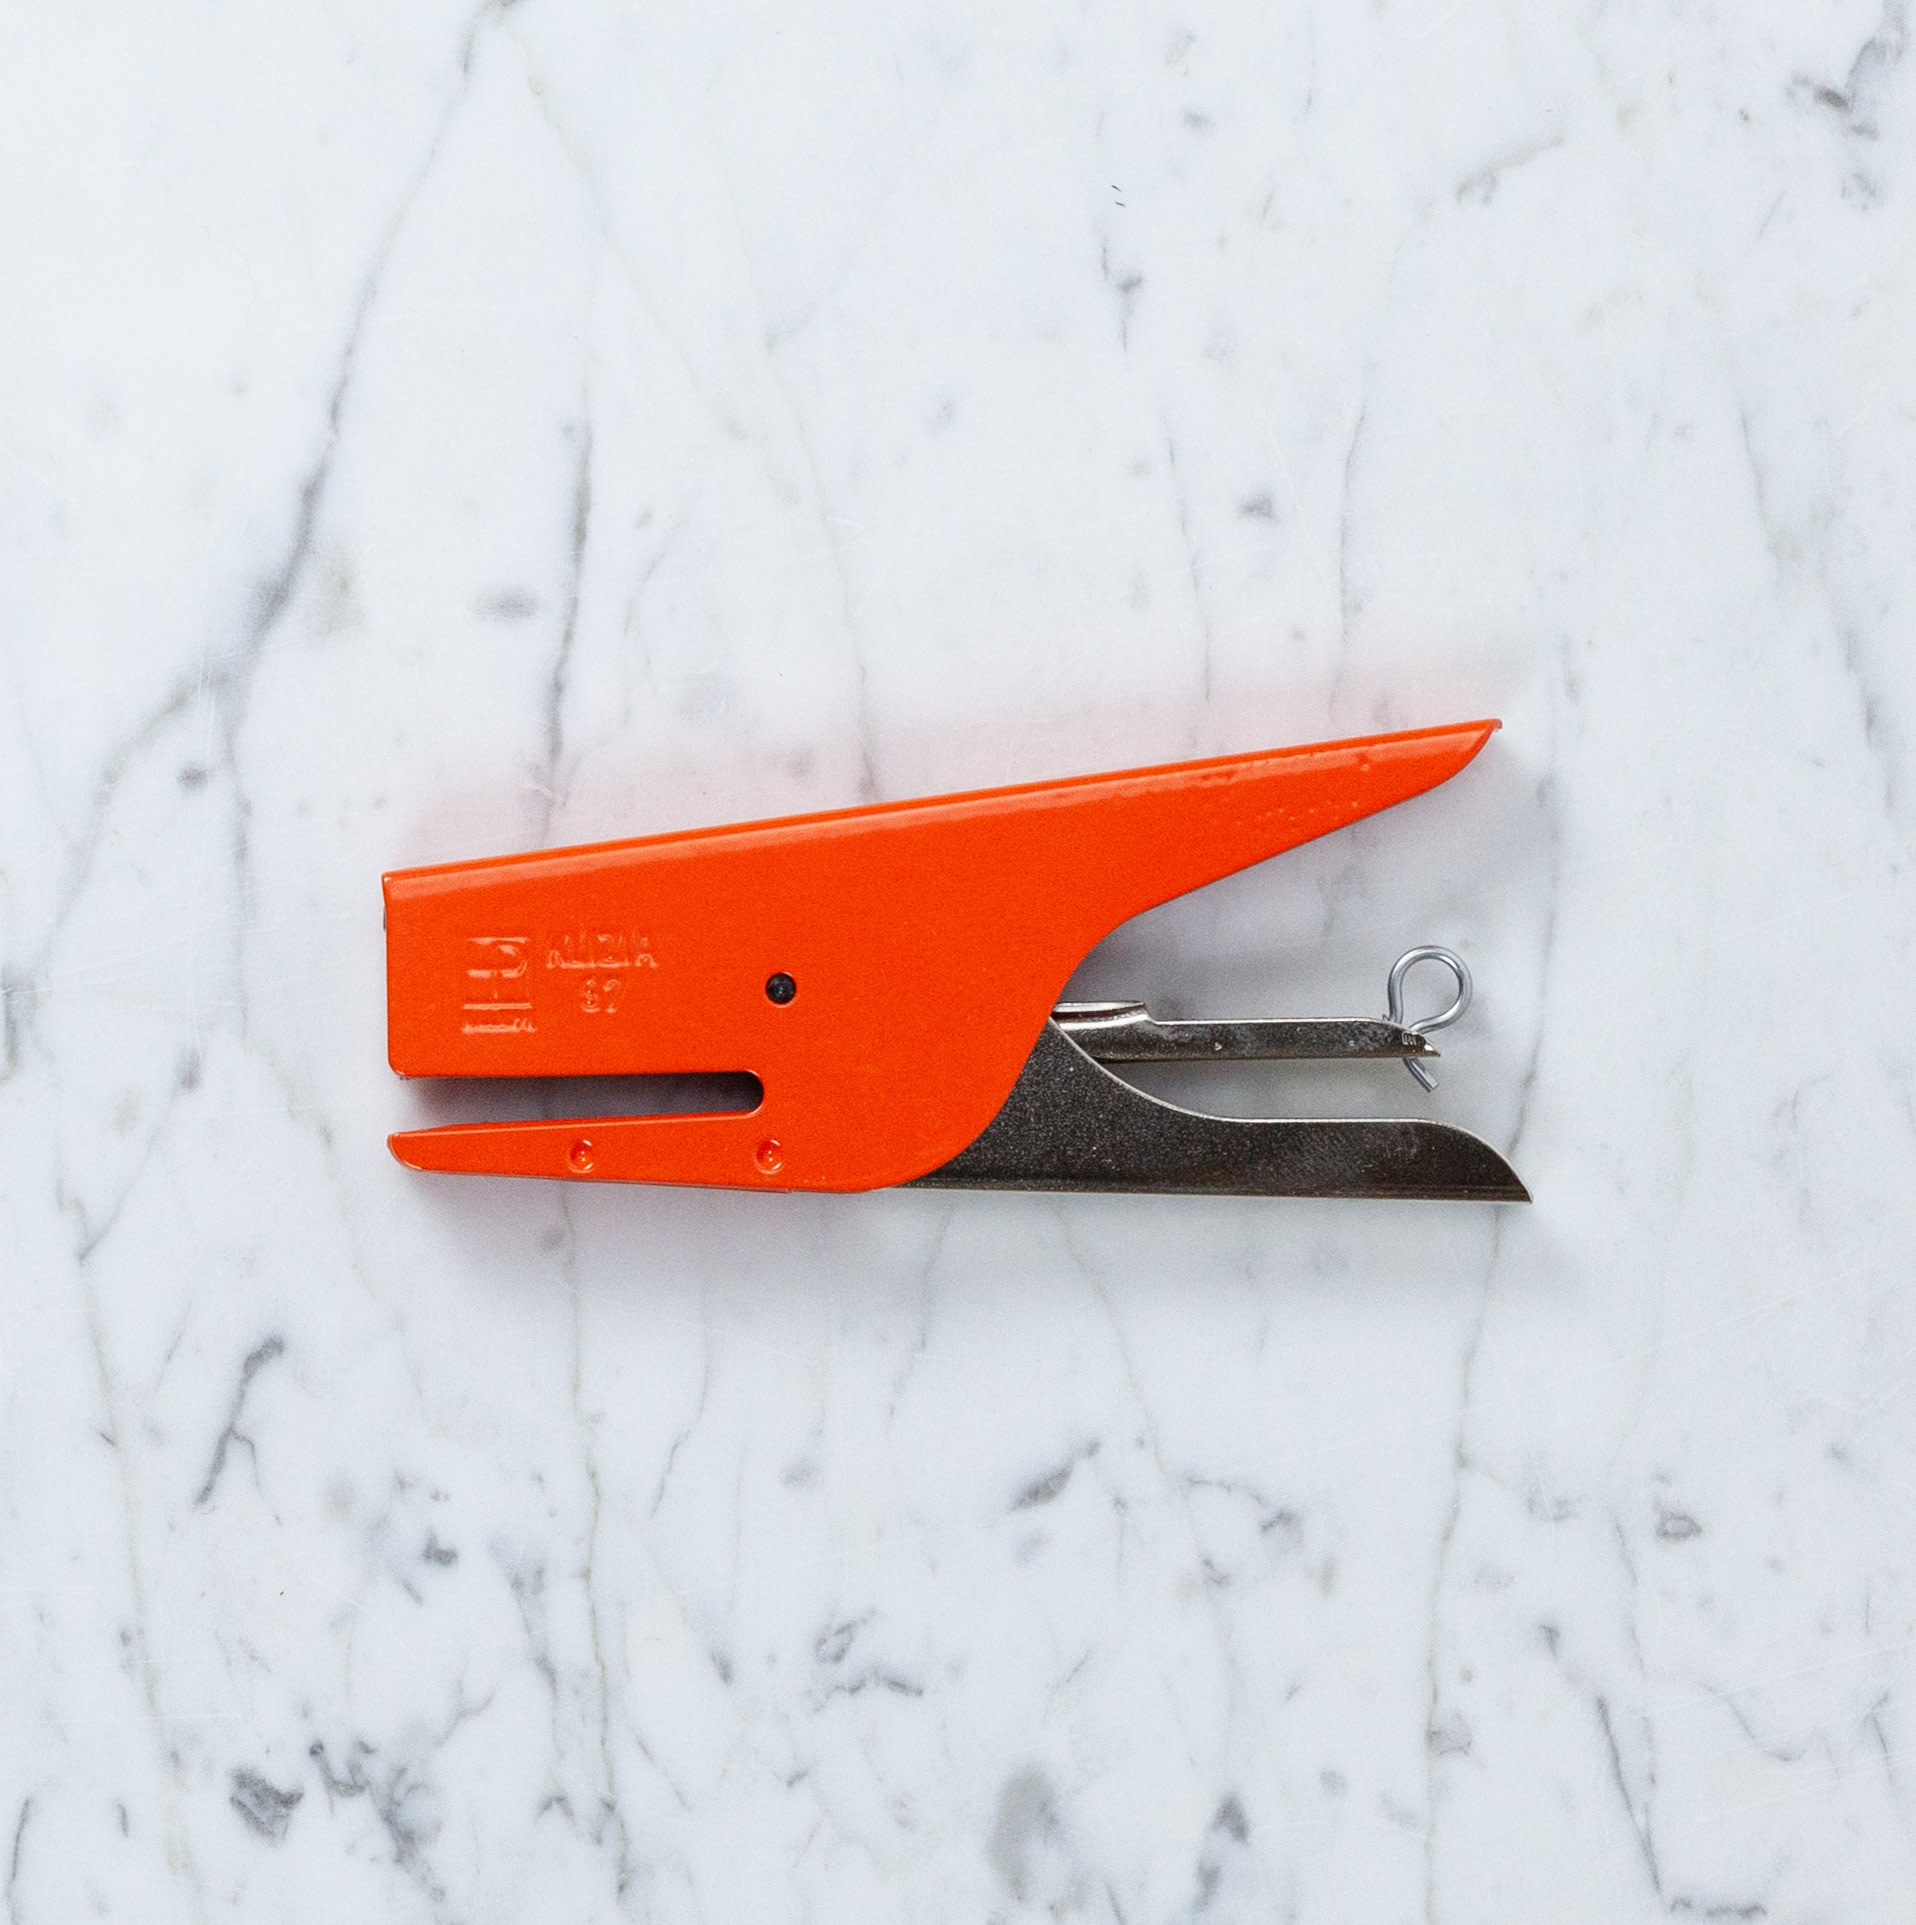 Klizia Italian Stapler - Orange